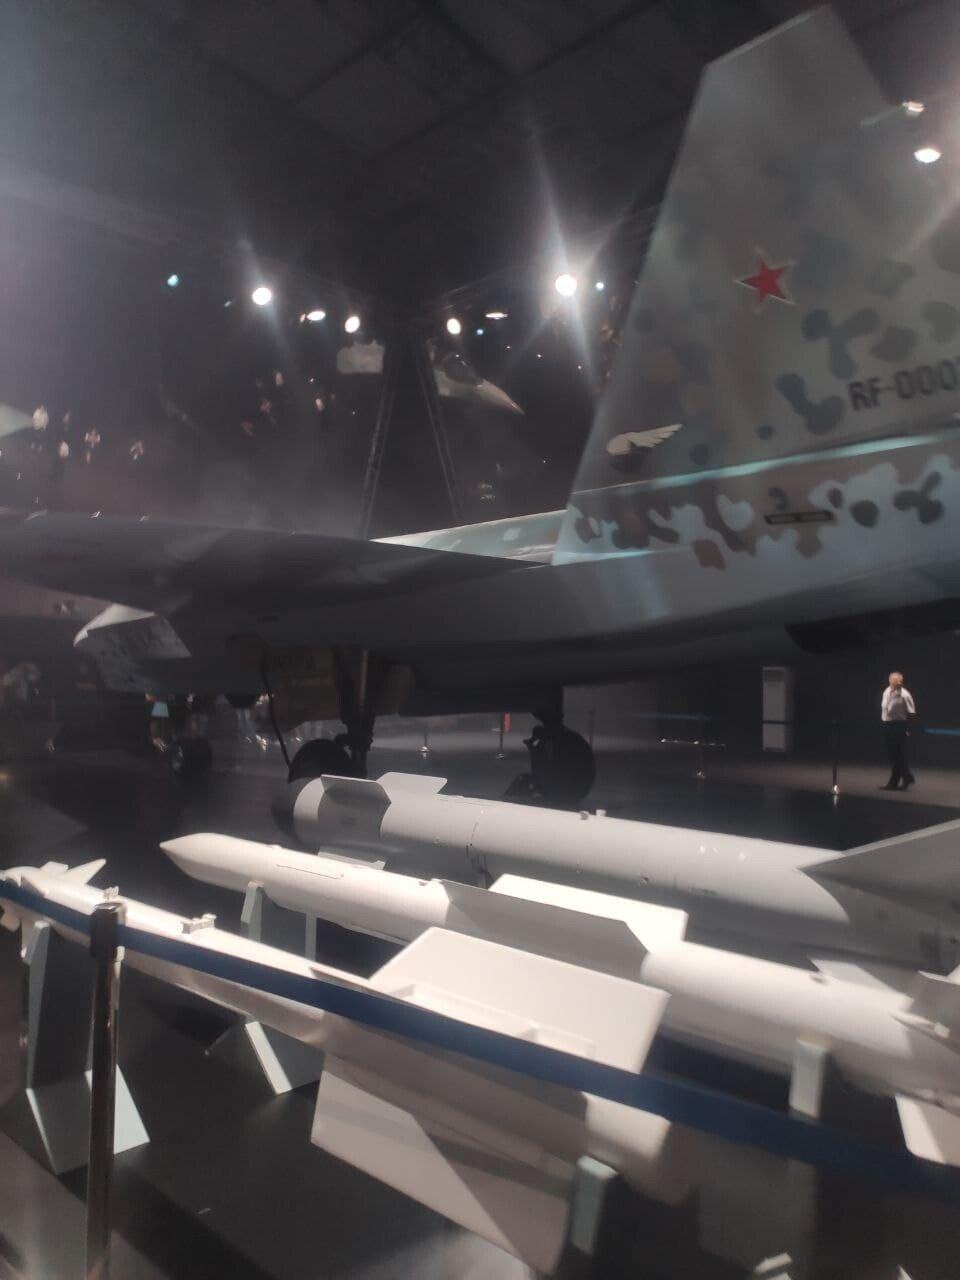 60f6ff3785f5400cc014fcc6.jpg 오늘 공개된 러시아의 신형 스텔스 전투기